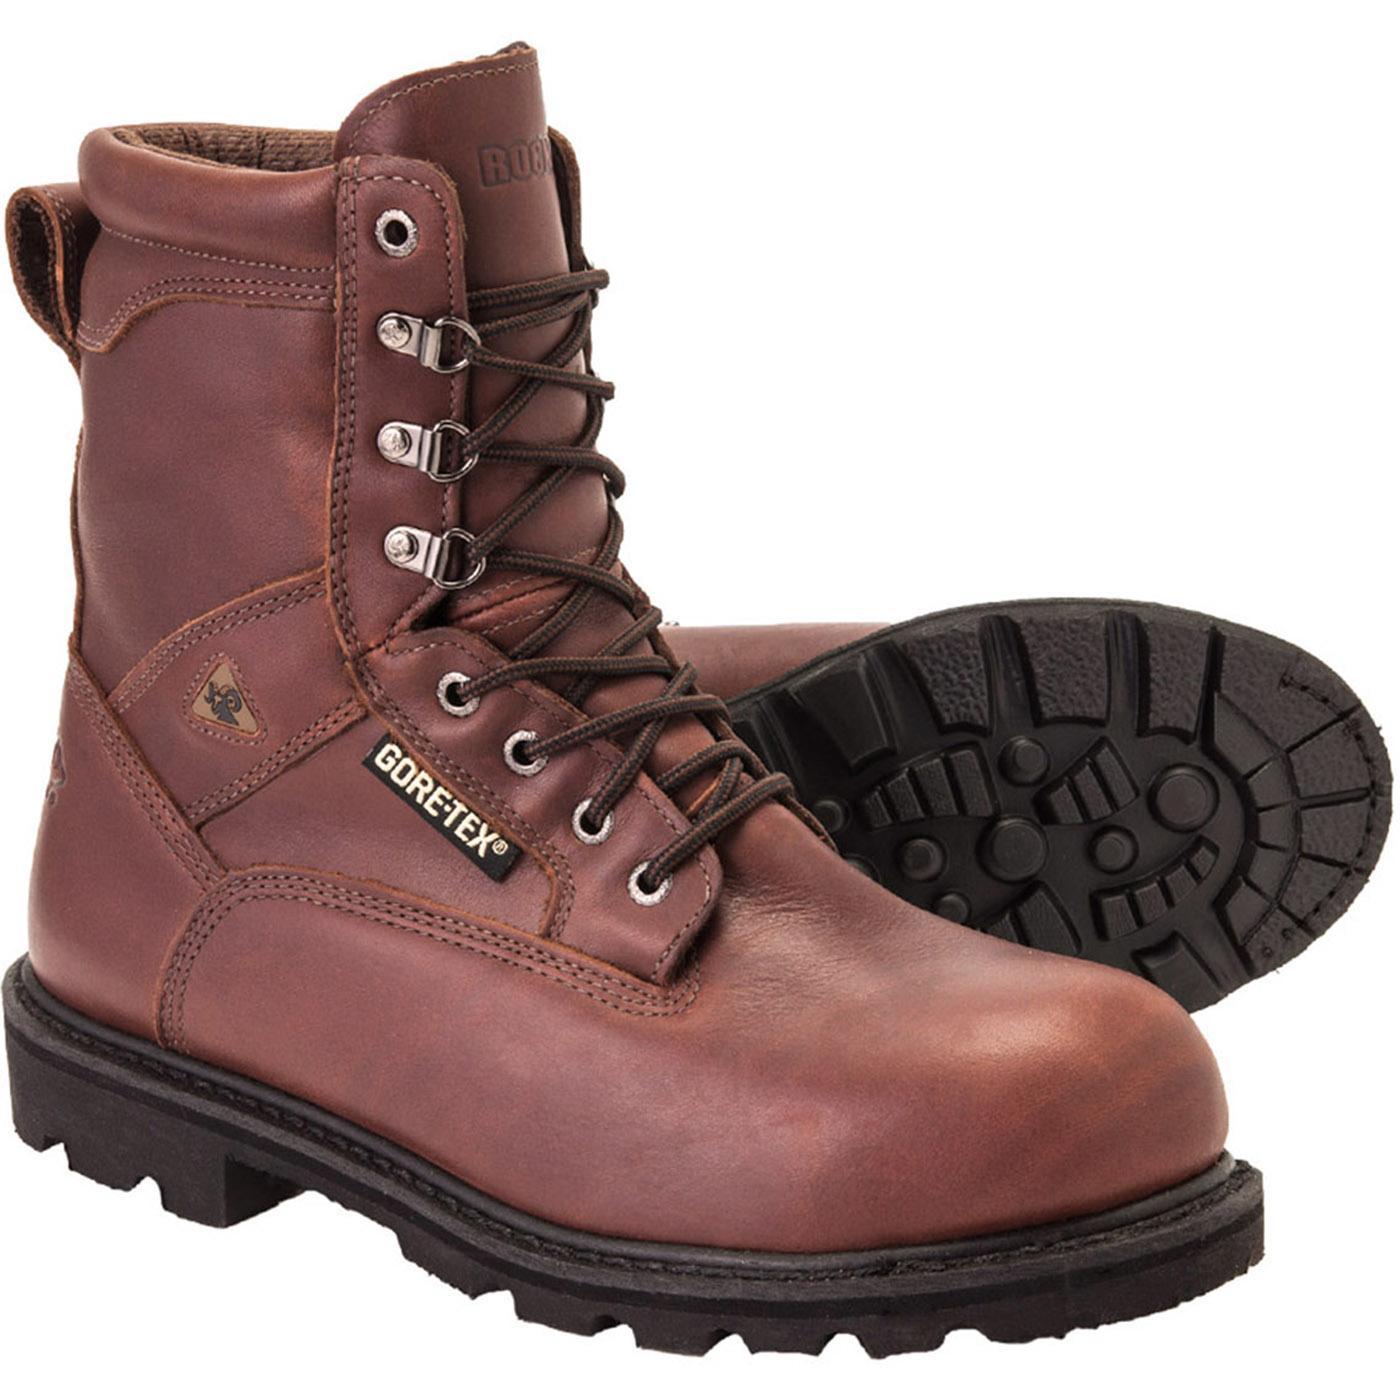 6224 Rocky Ranger Steel Toe Gore Tex 174 Work Boots